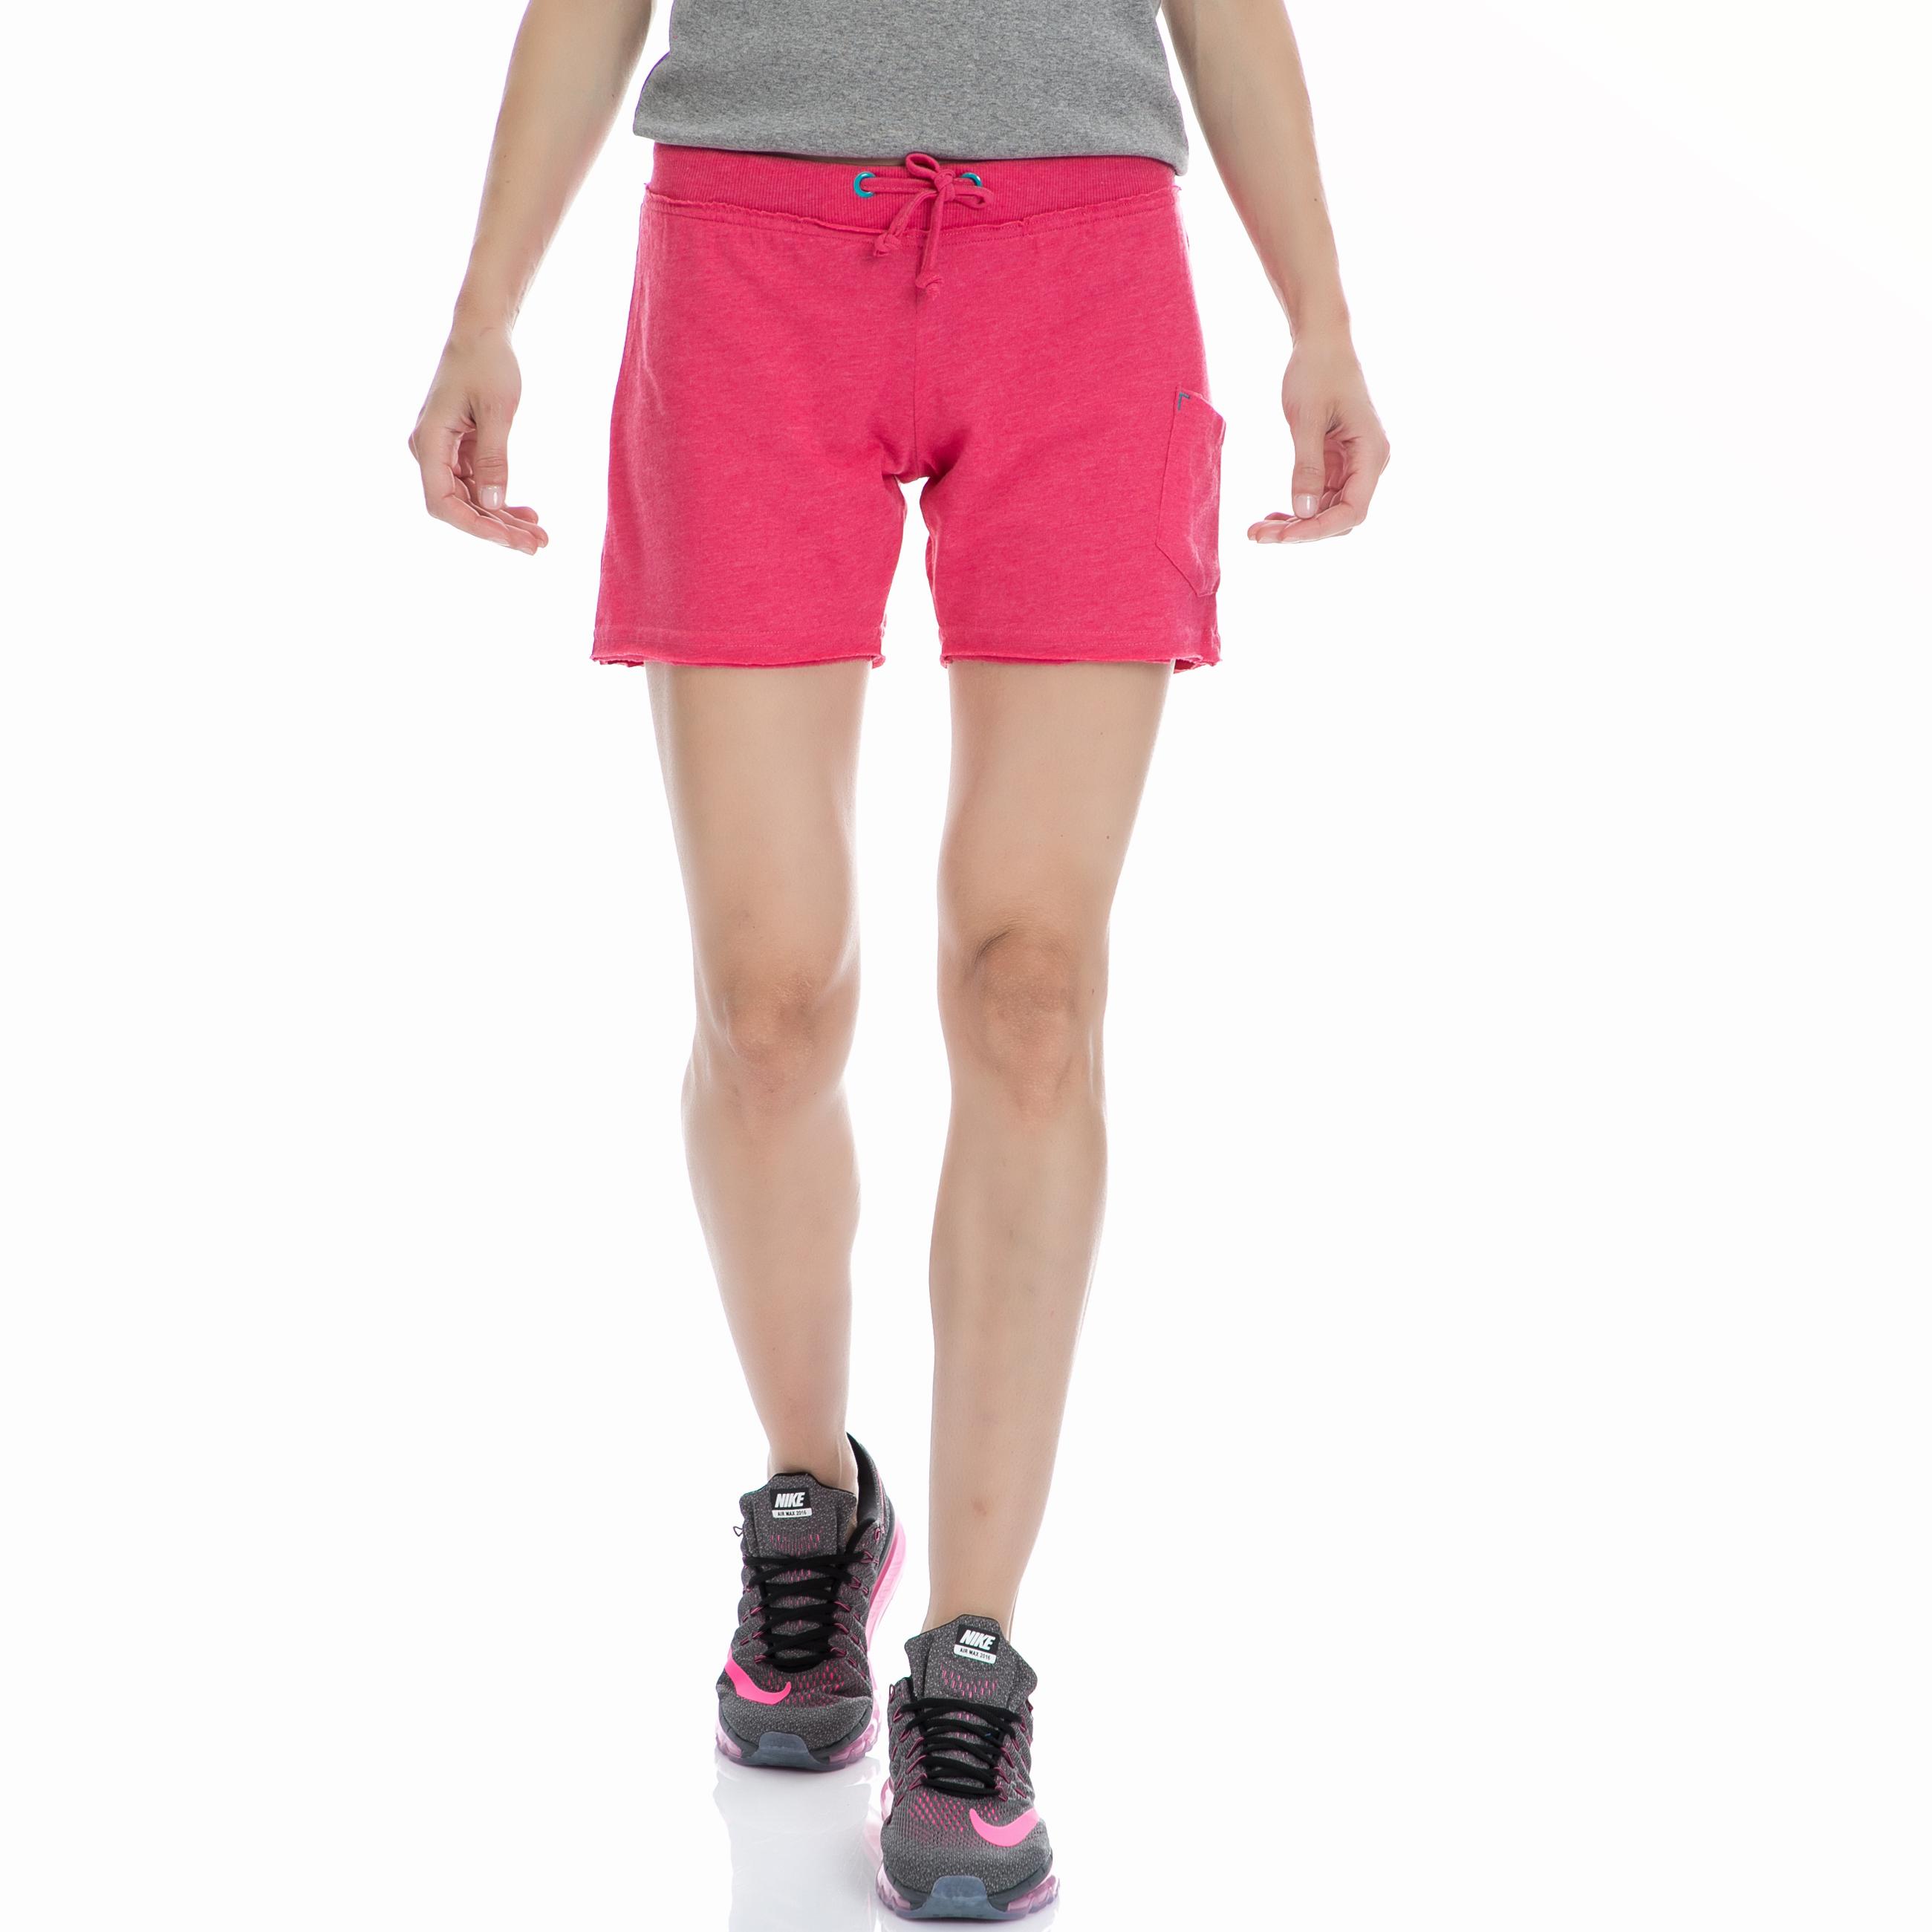 BODYTALK - Γυαναικείο σορτς BODYTALK ροζ γυναικεία ρούχα σορτς βερμούδες αθλητικά